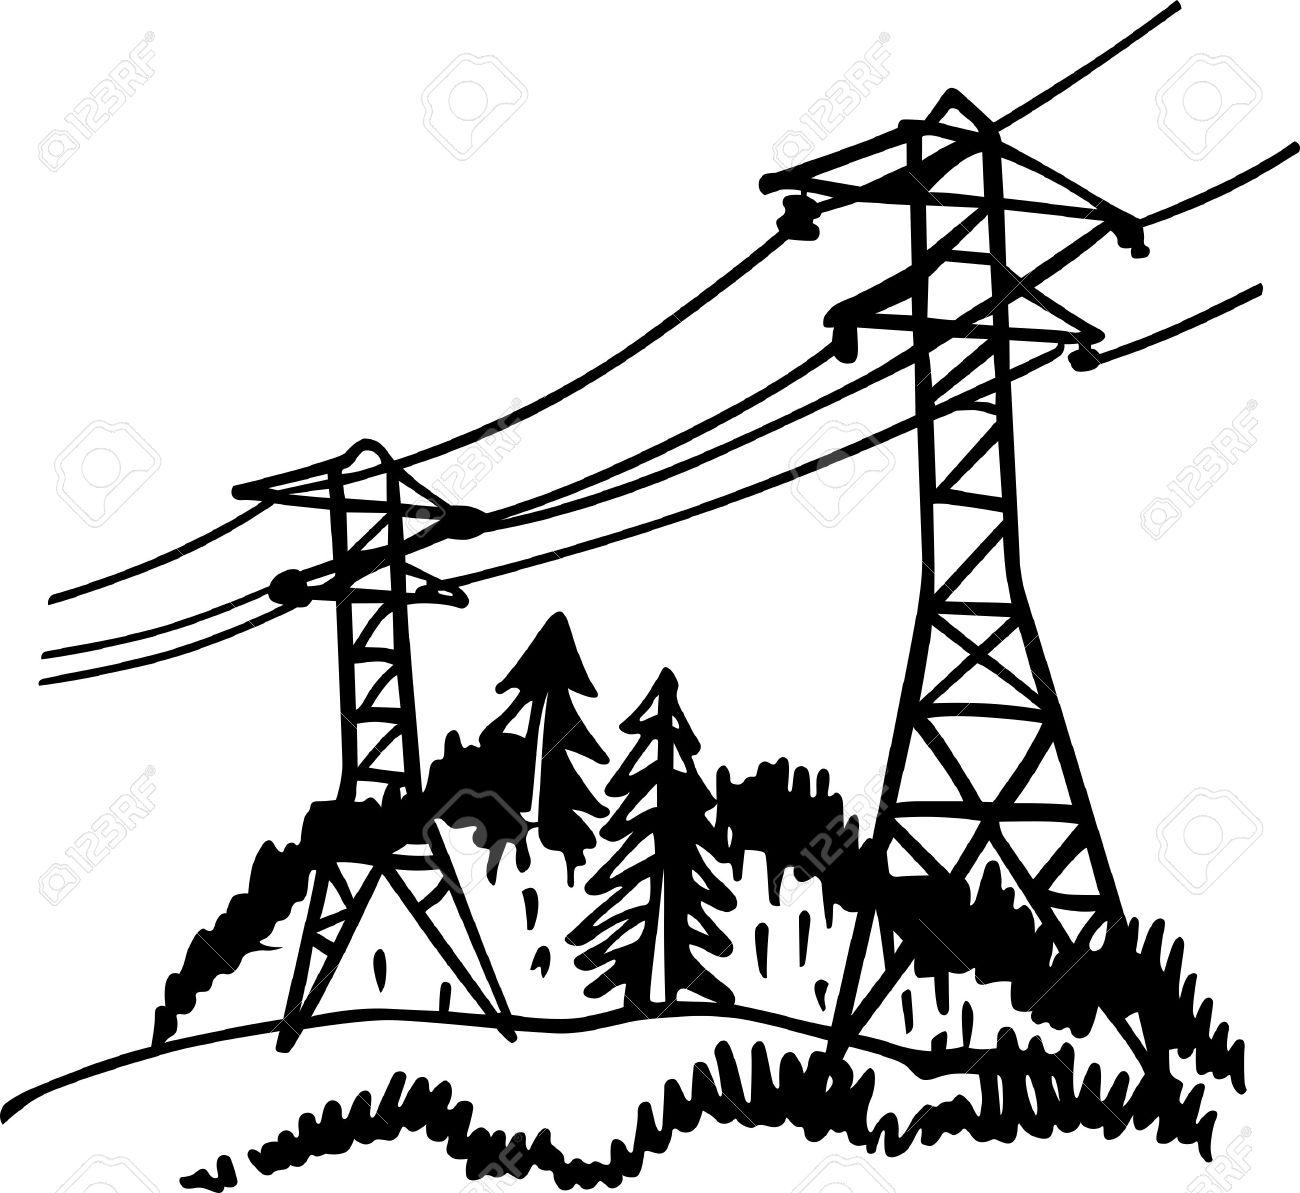 Power Line Clipart